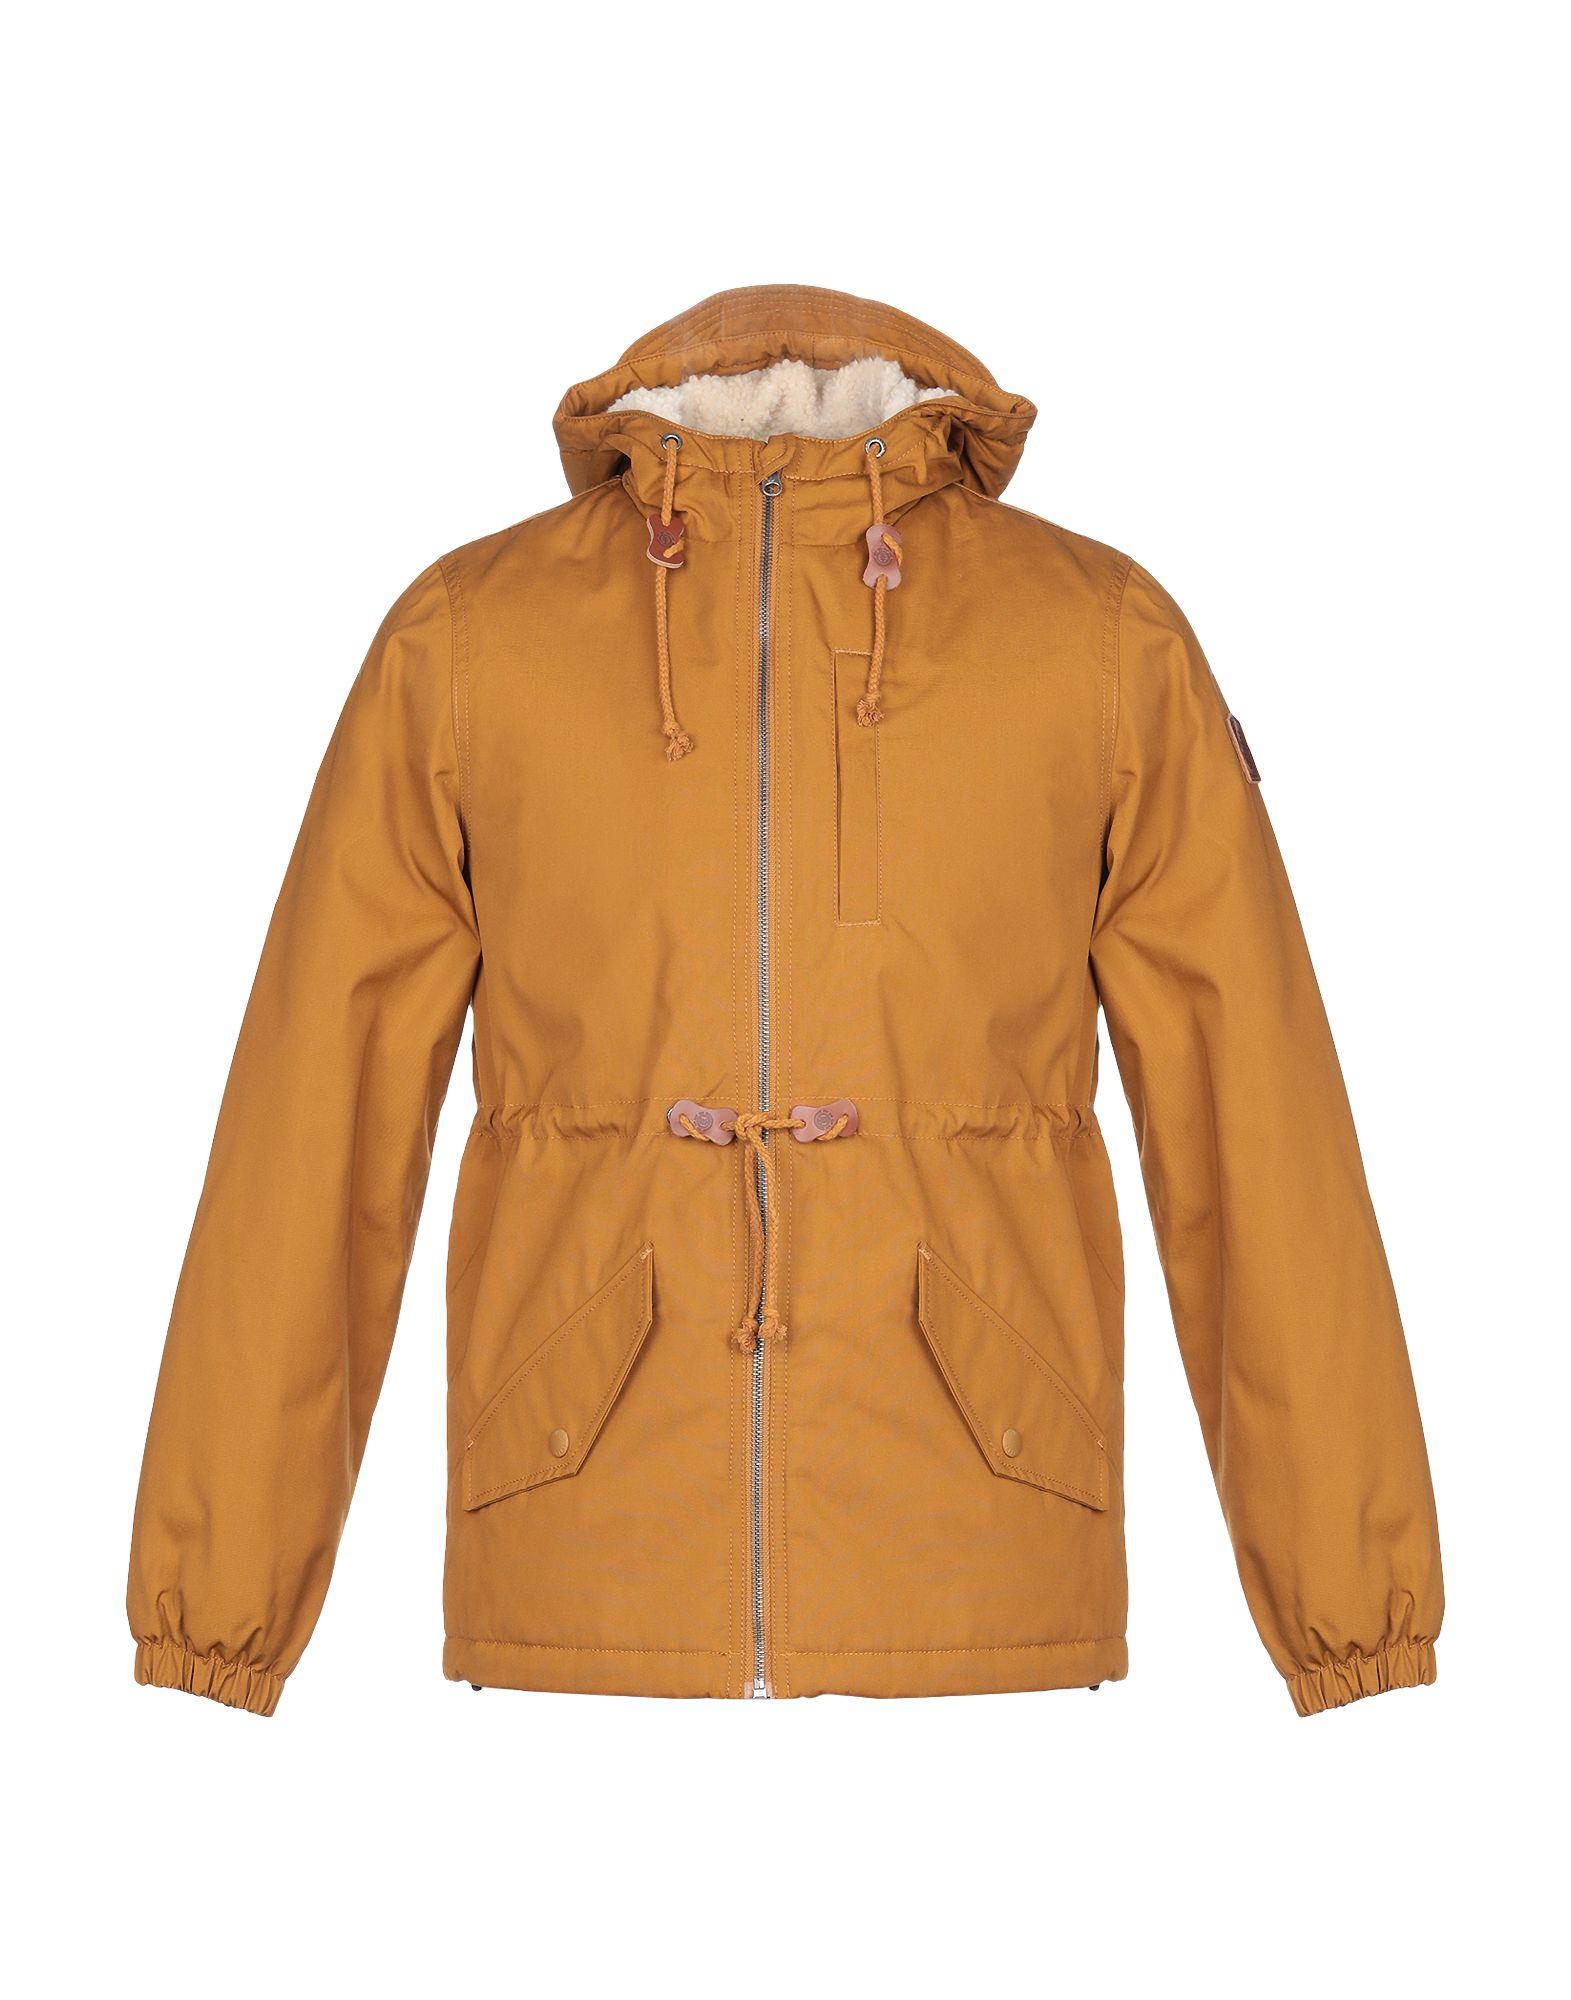 ELEMENT WOLFEBORO COLLECTION Пуховик с синт. наполнителем element wolfeboro collection куртка